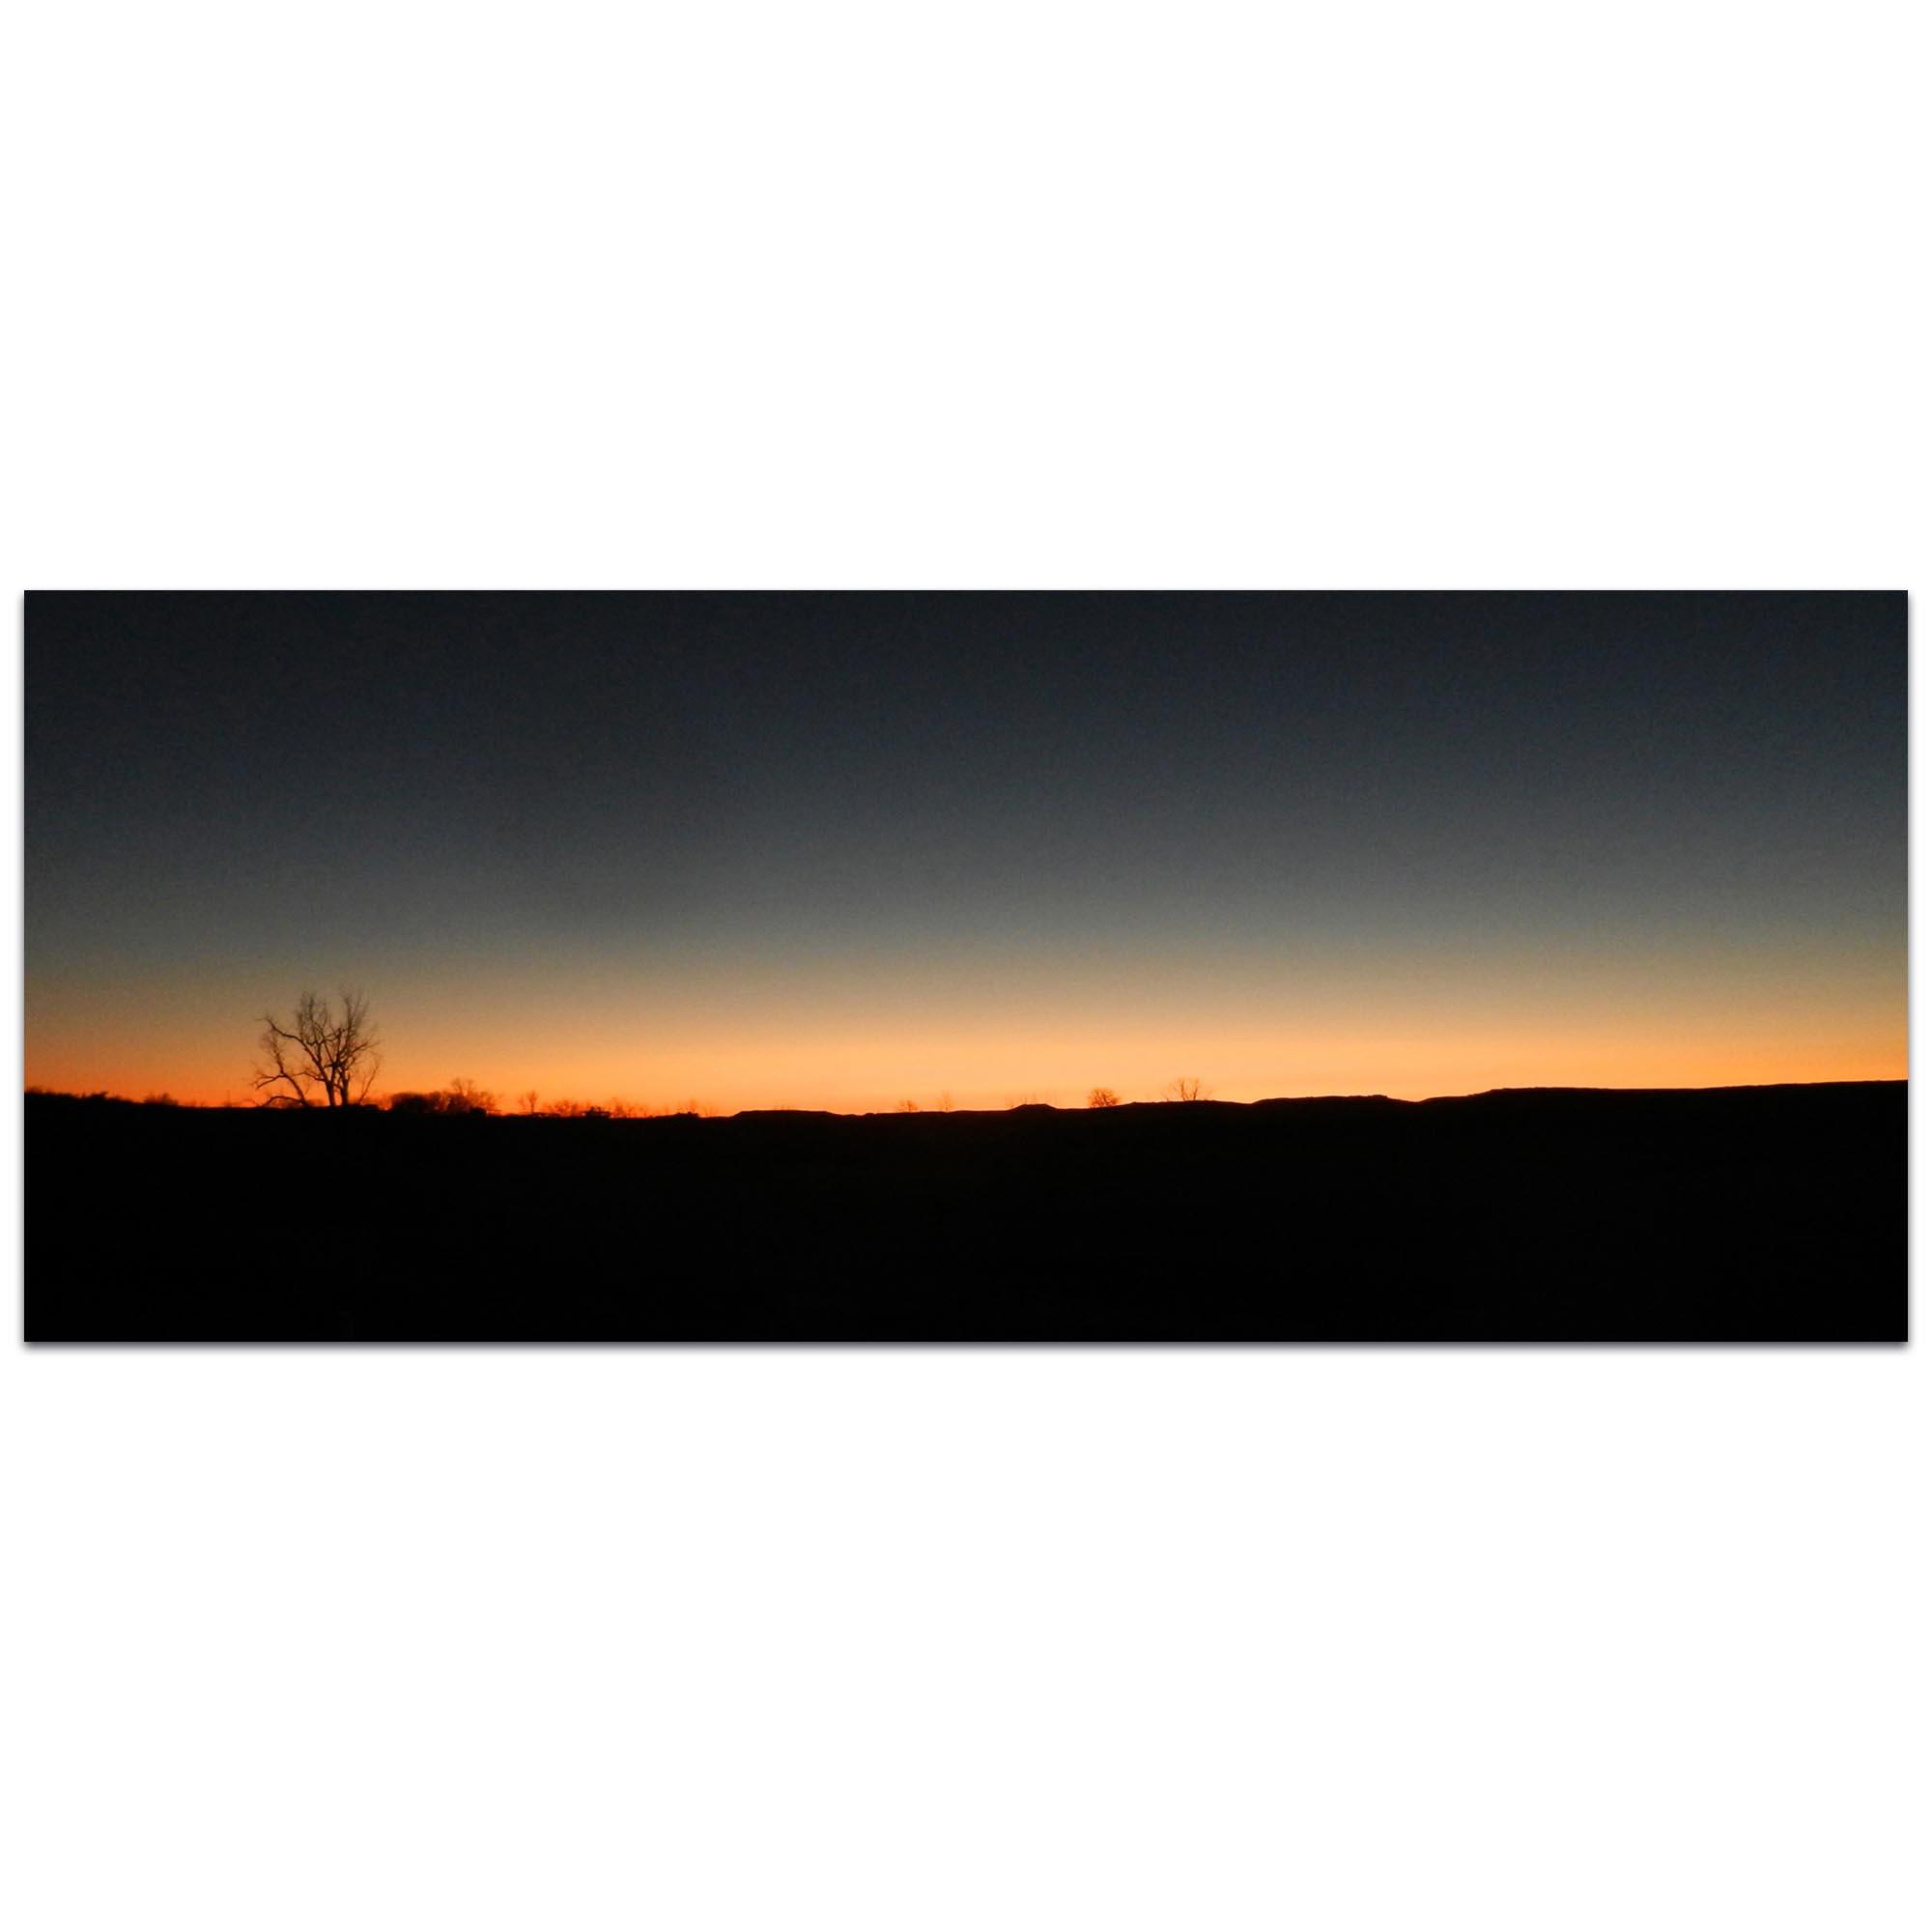 Western Wall Art 'Desert Sunset' - American West Decor on Metal or Plexiglass